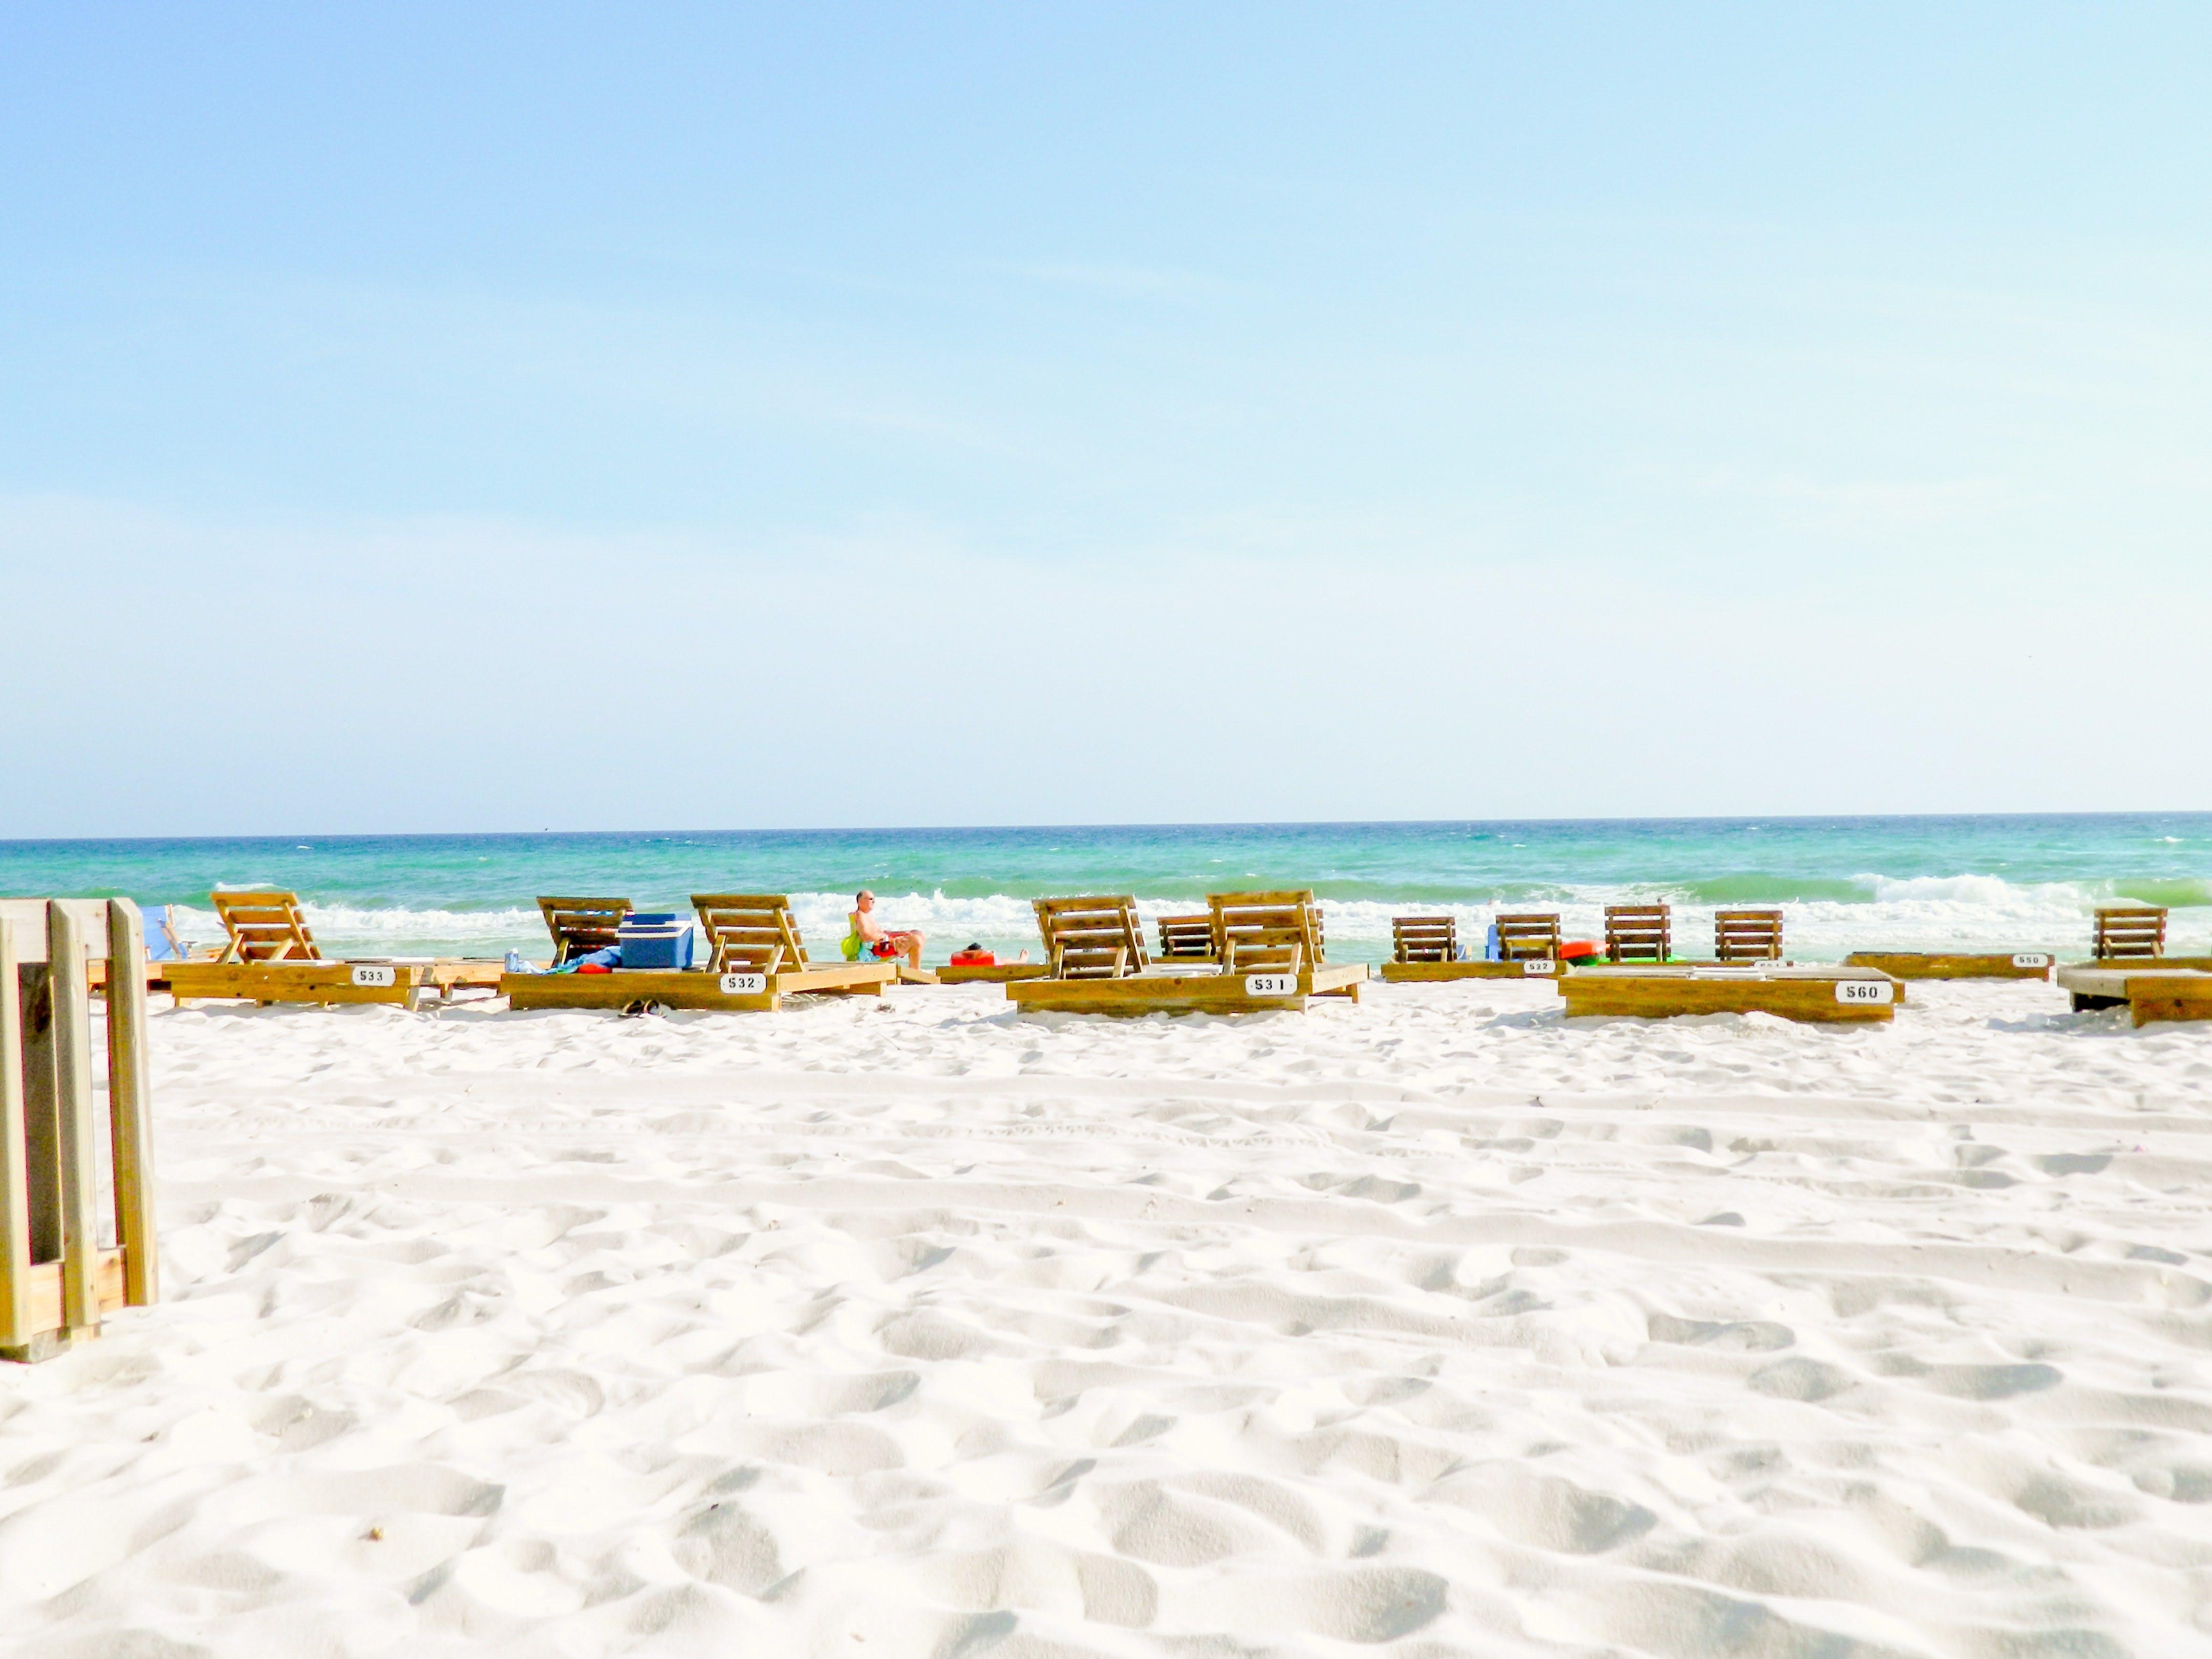 Pana markup city Beach, Florida, USA